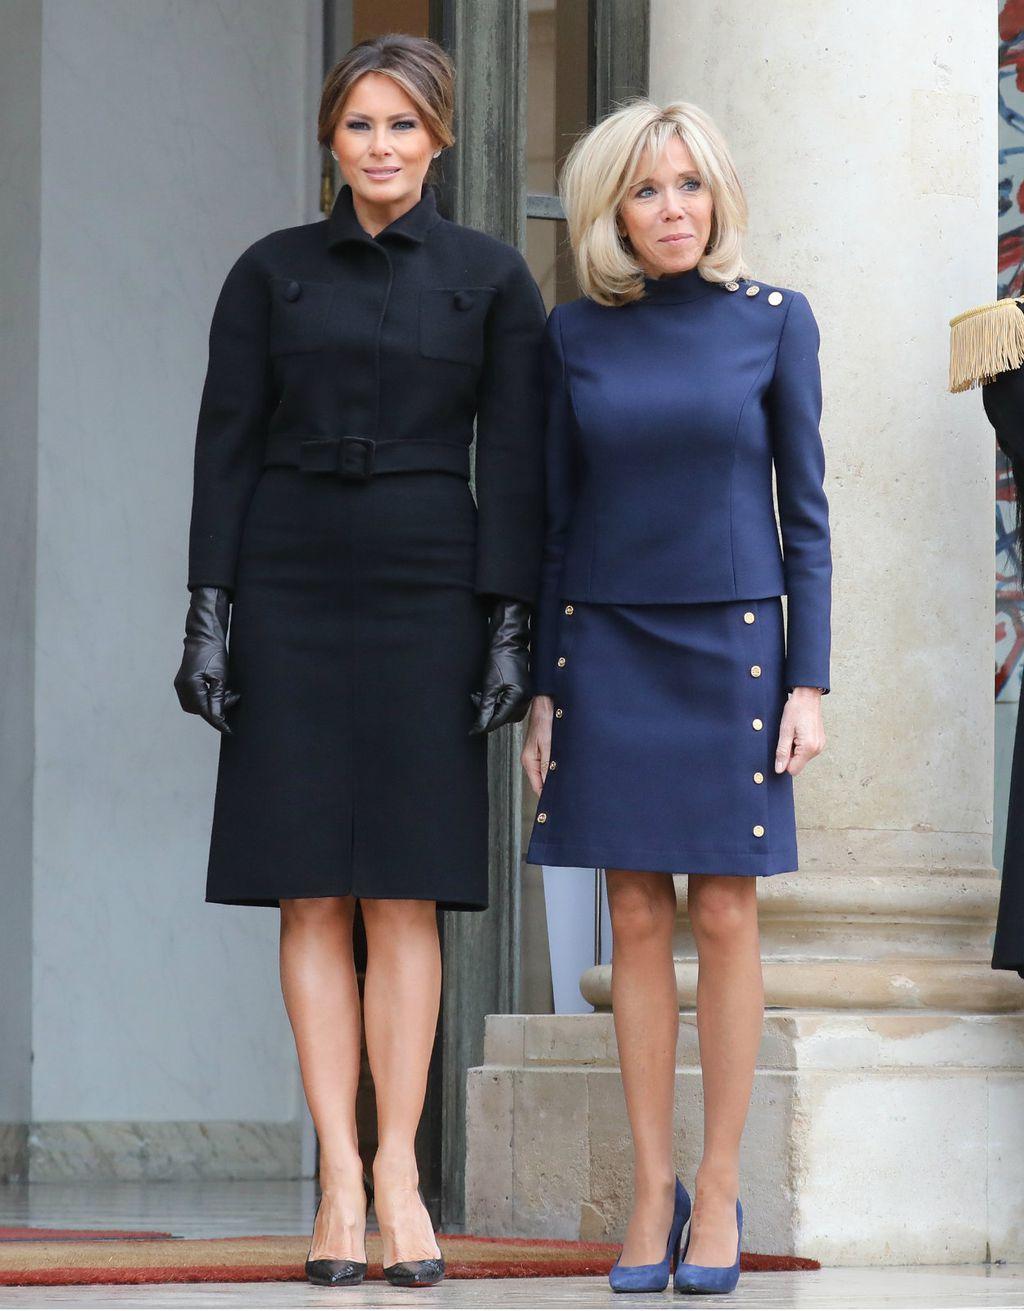 Melania i Brigitte susrele su se u Parizu